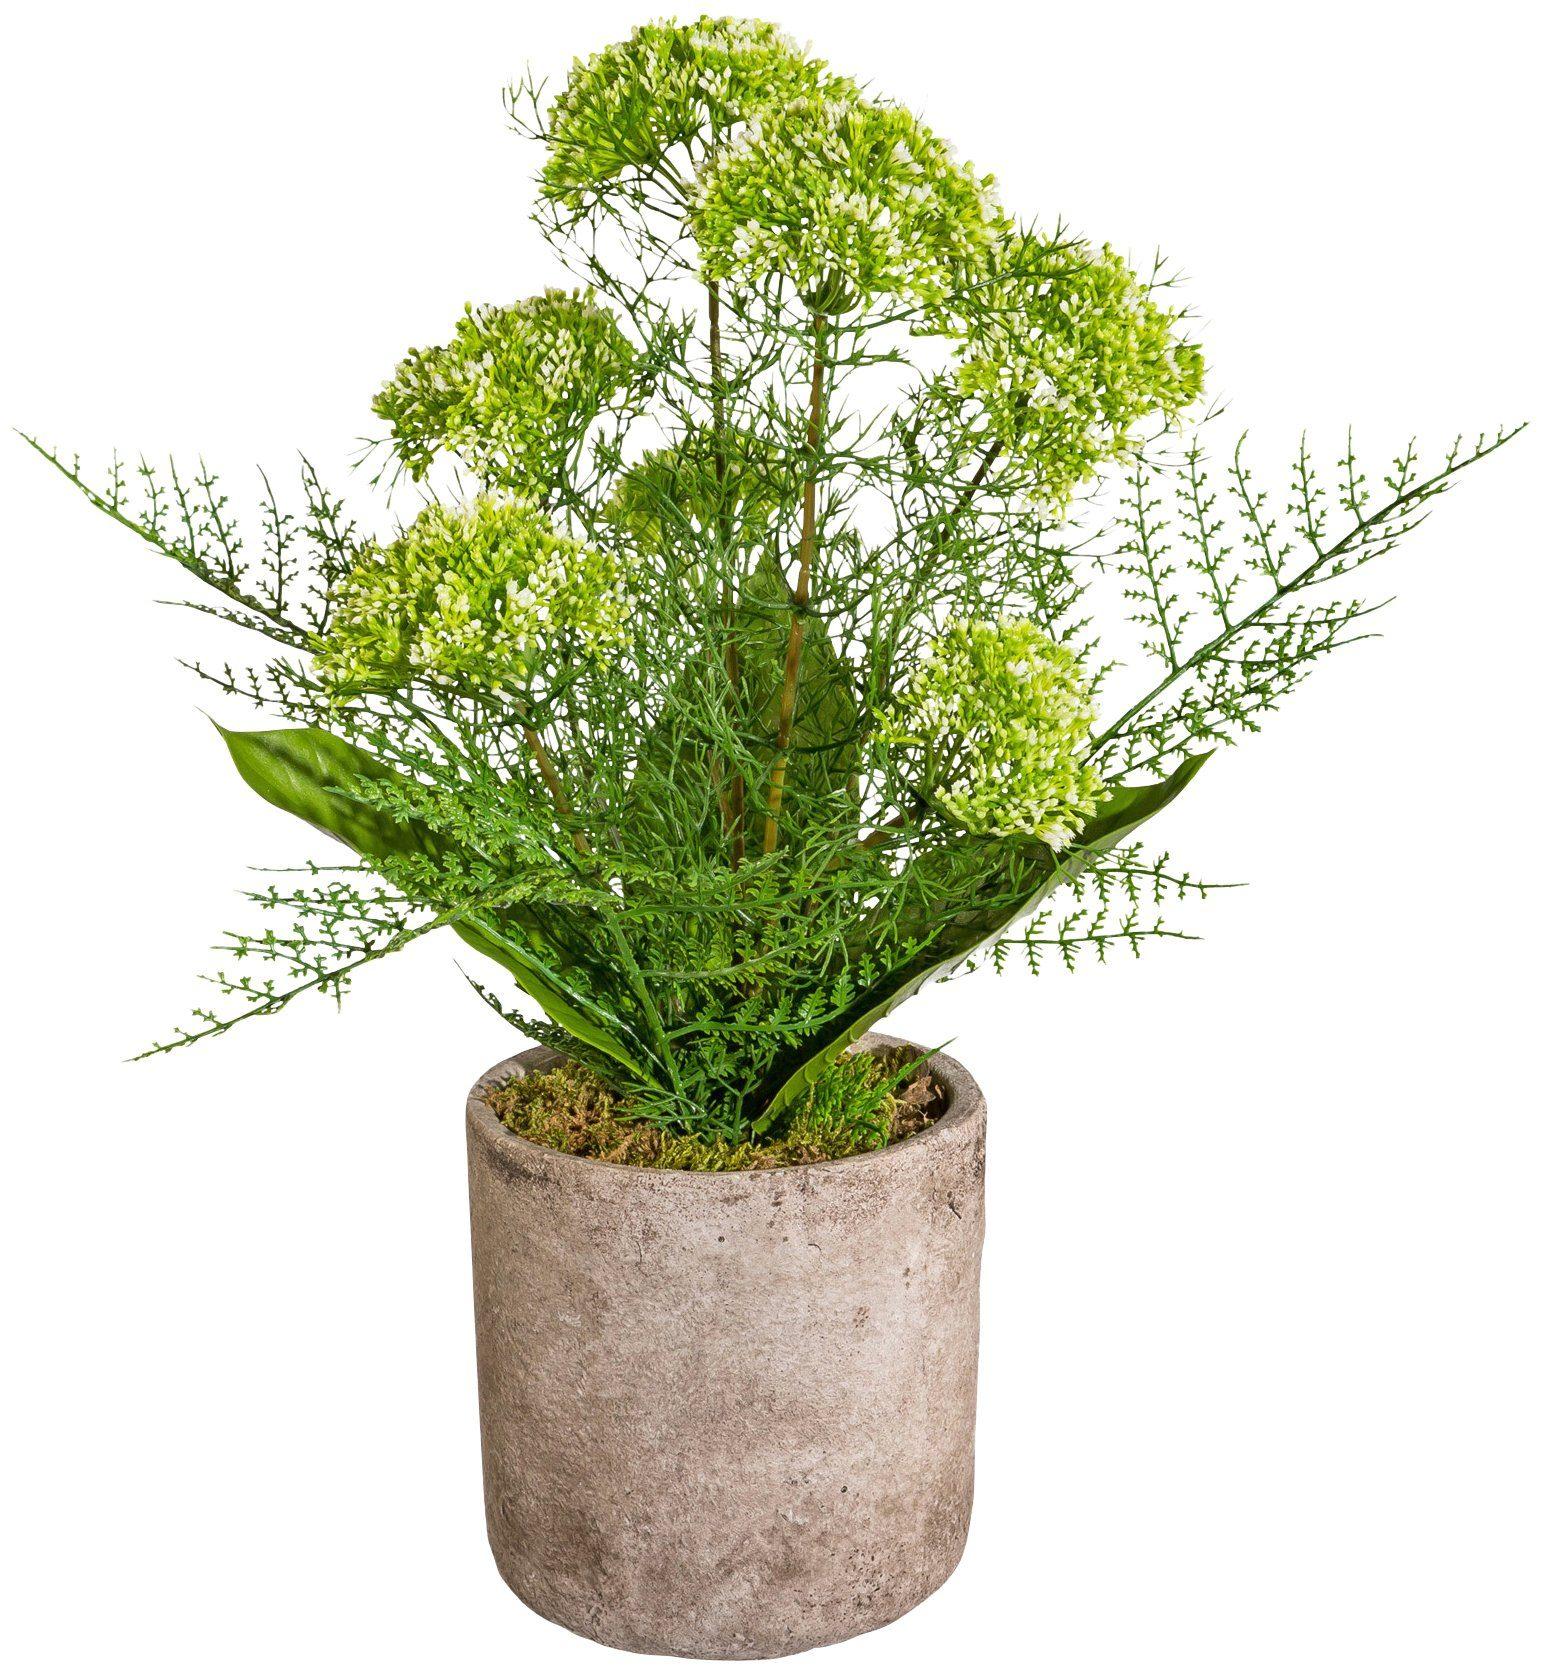 Kunstpflanze »Alliumbusch«, im Keramiktopf, Höhe 55 cm, grün